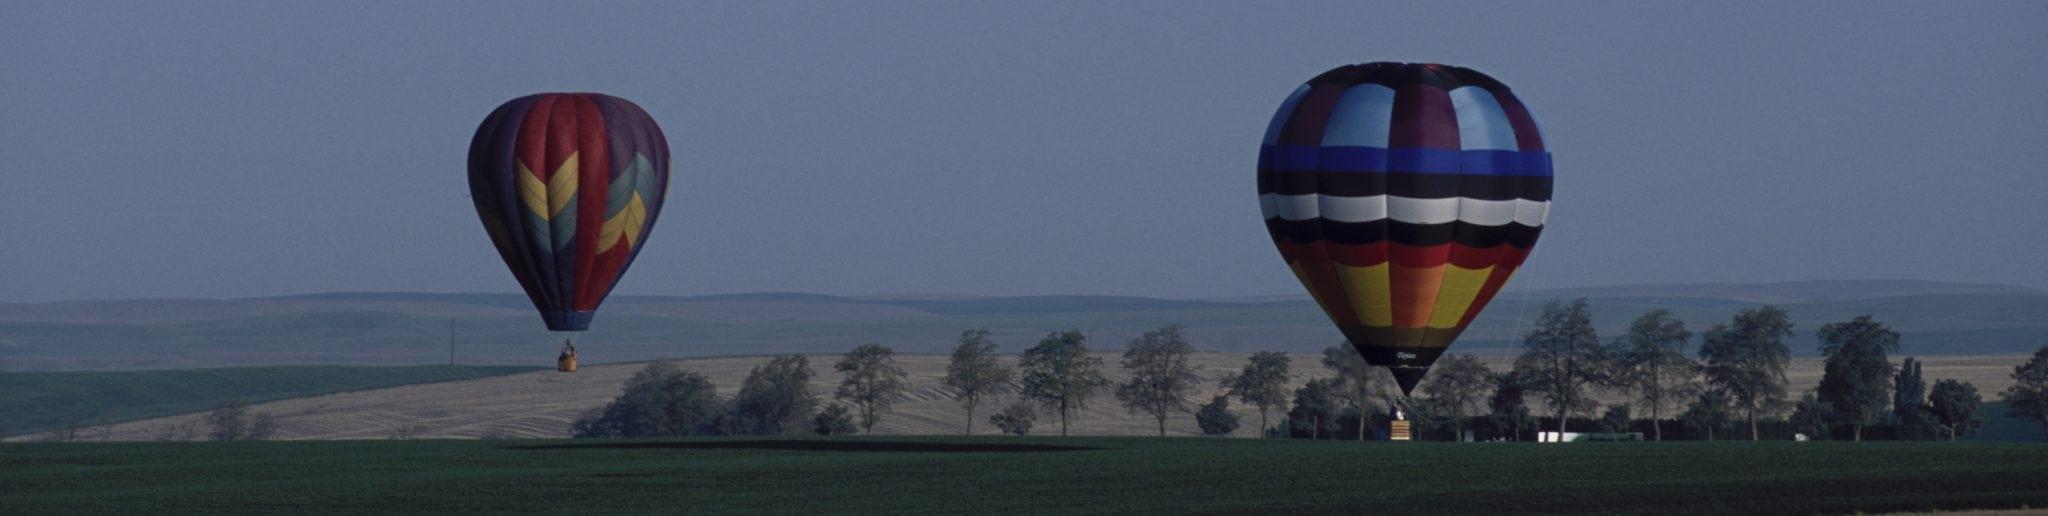 Hot air balloons over Walla Walla